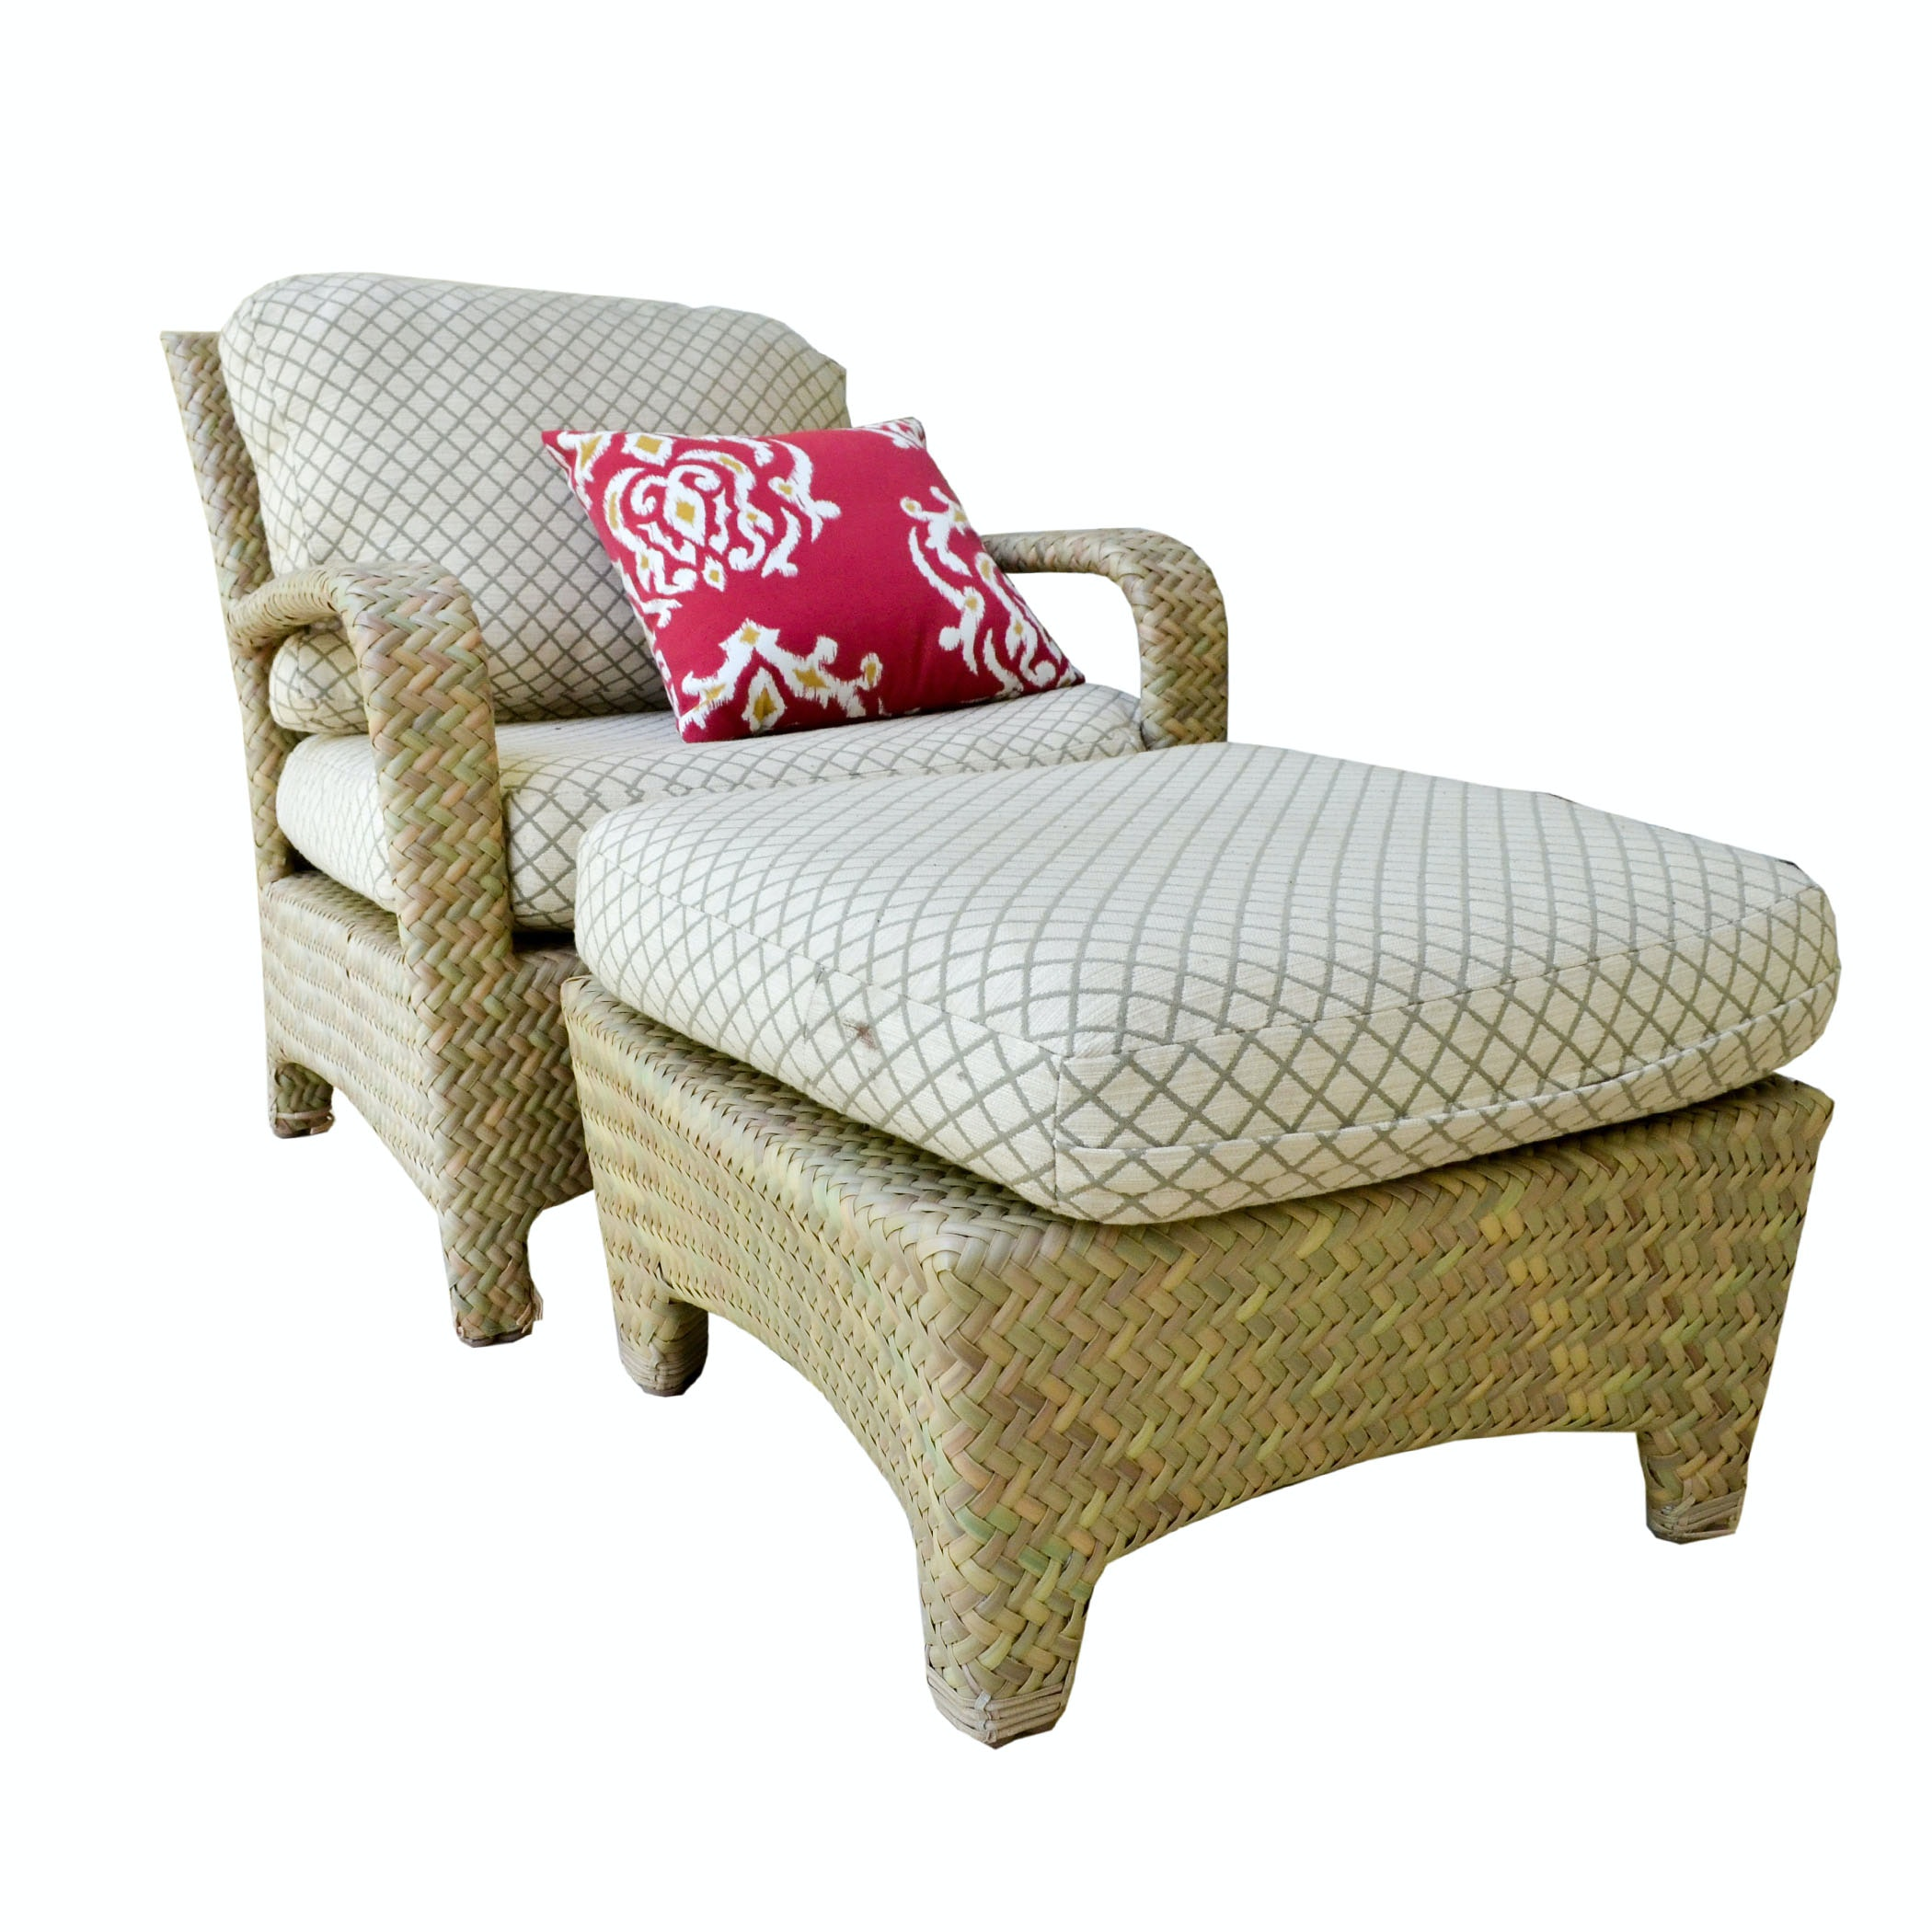 Brown Jordan Rattan Patio Chair with Ottoman EBTH